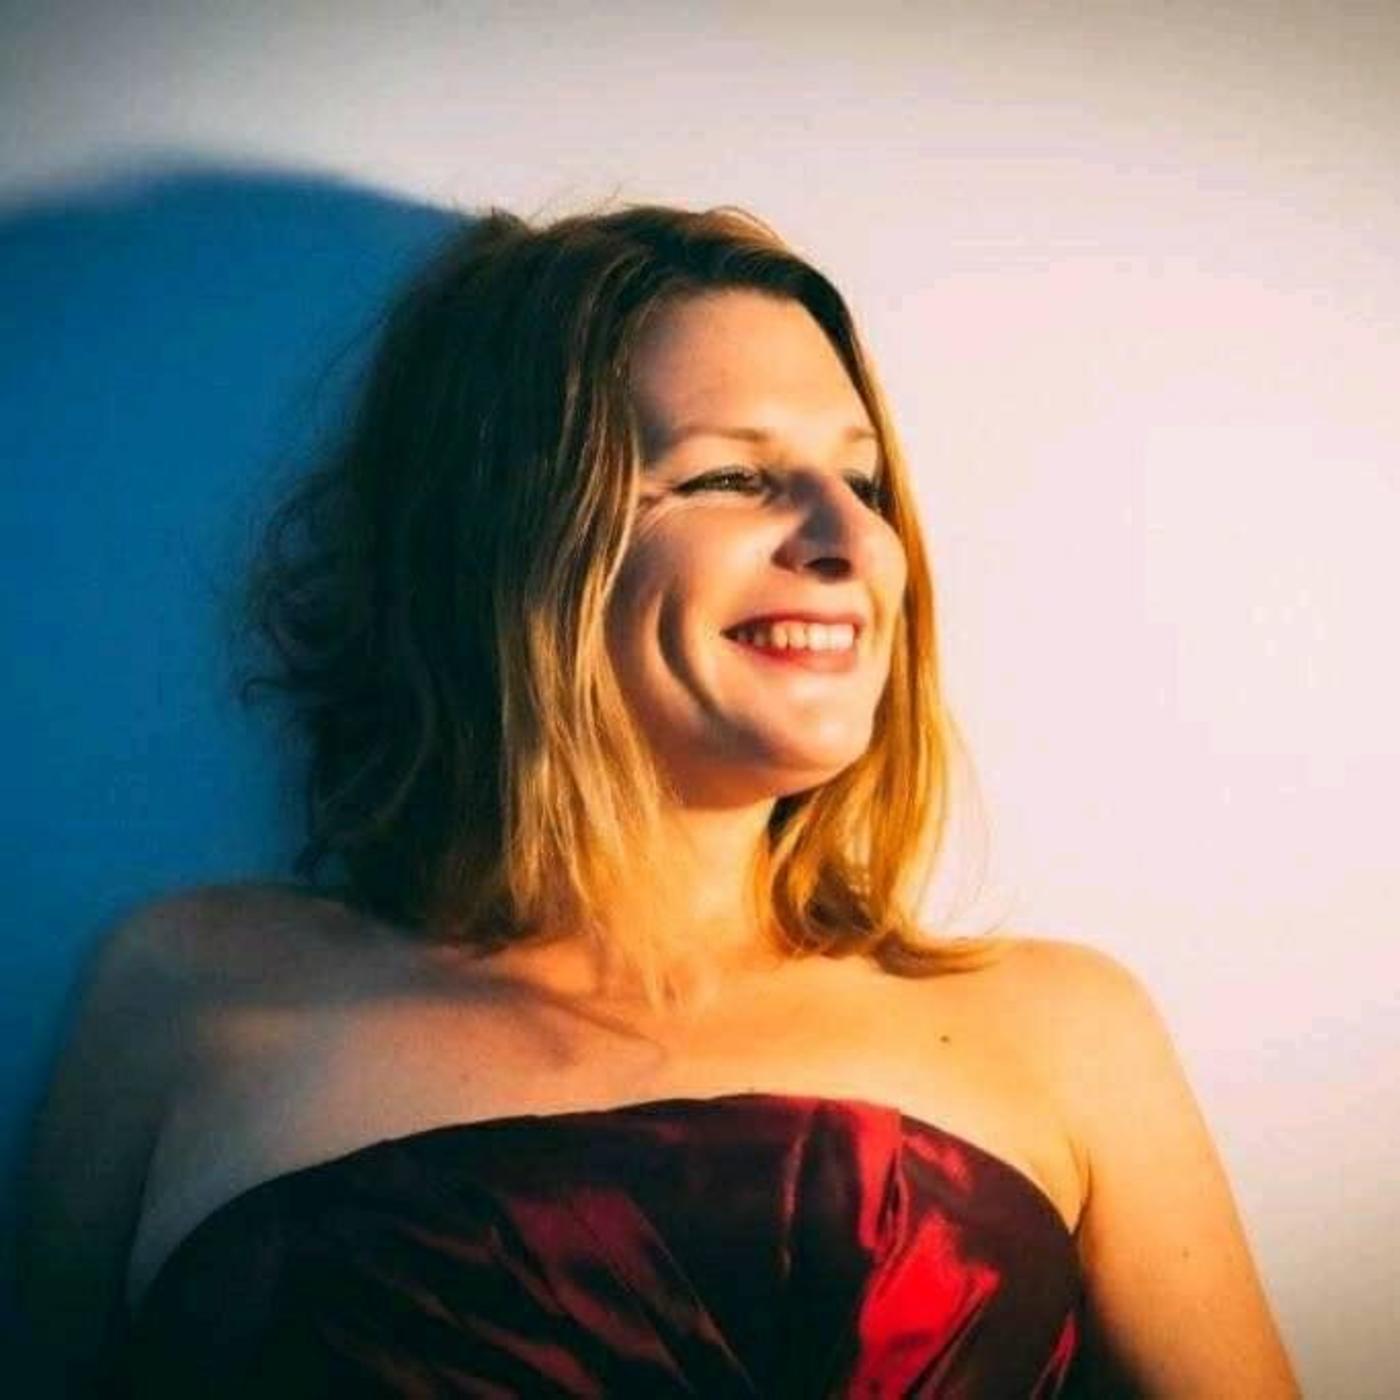 Entrevista de Zine, Cantairitz nissarda (OC)